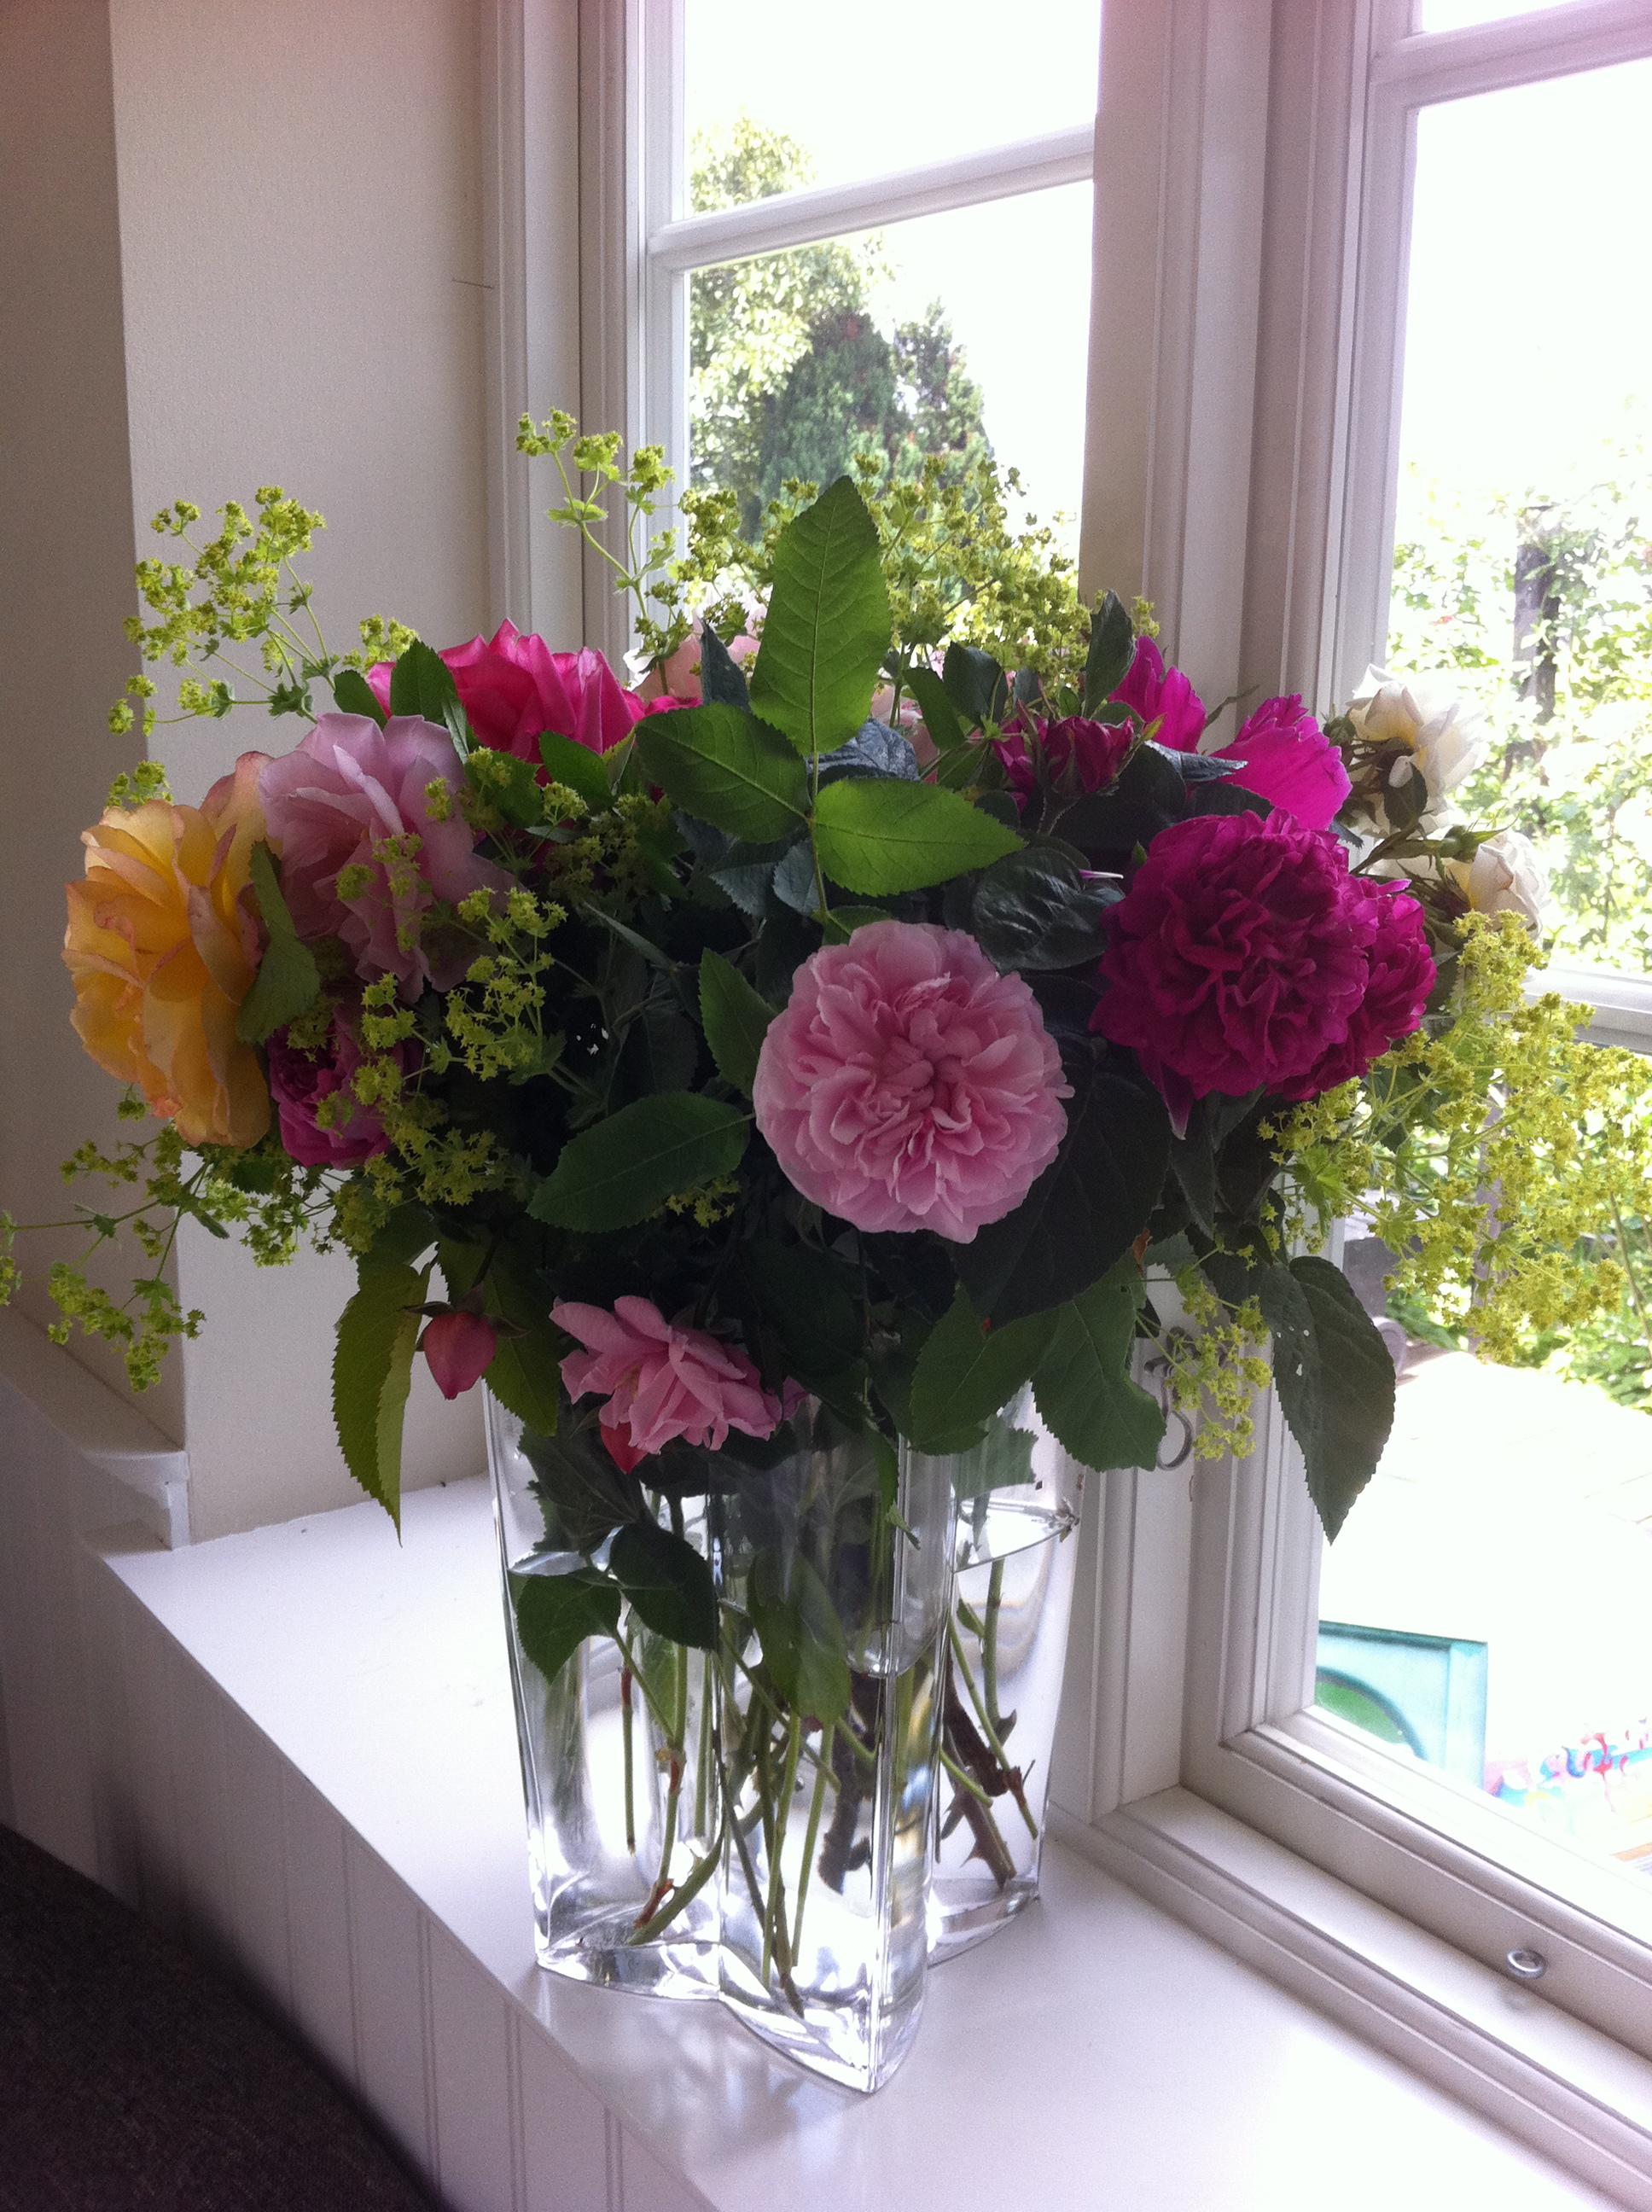 Undgå kalk i vaser